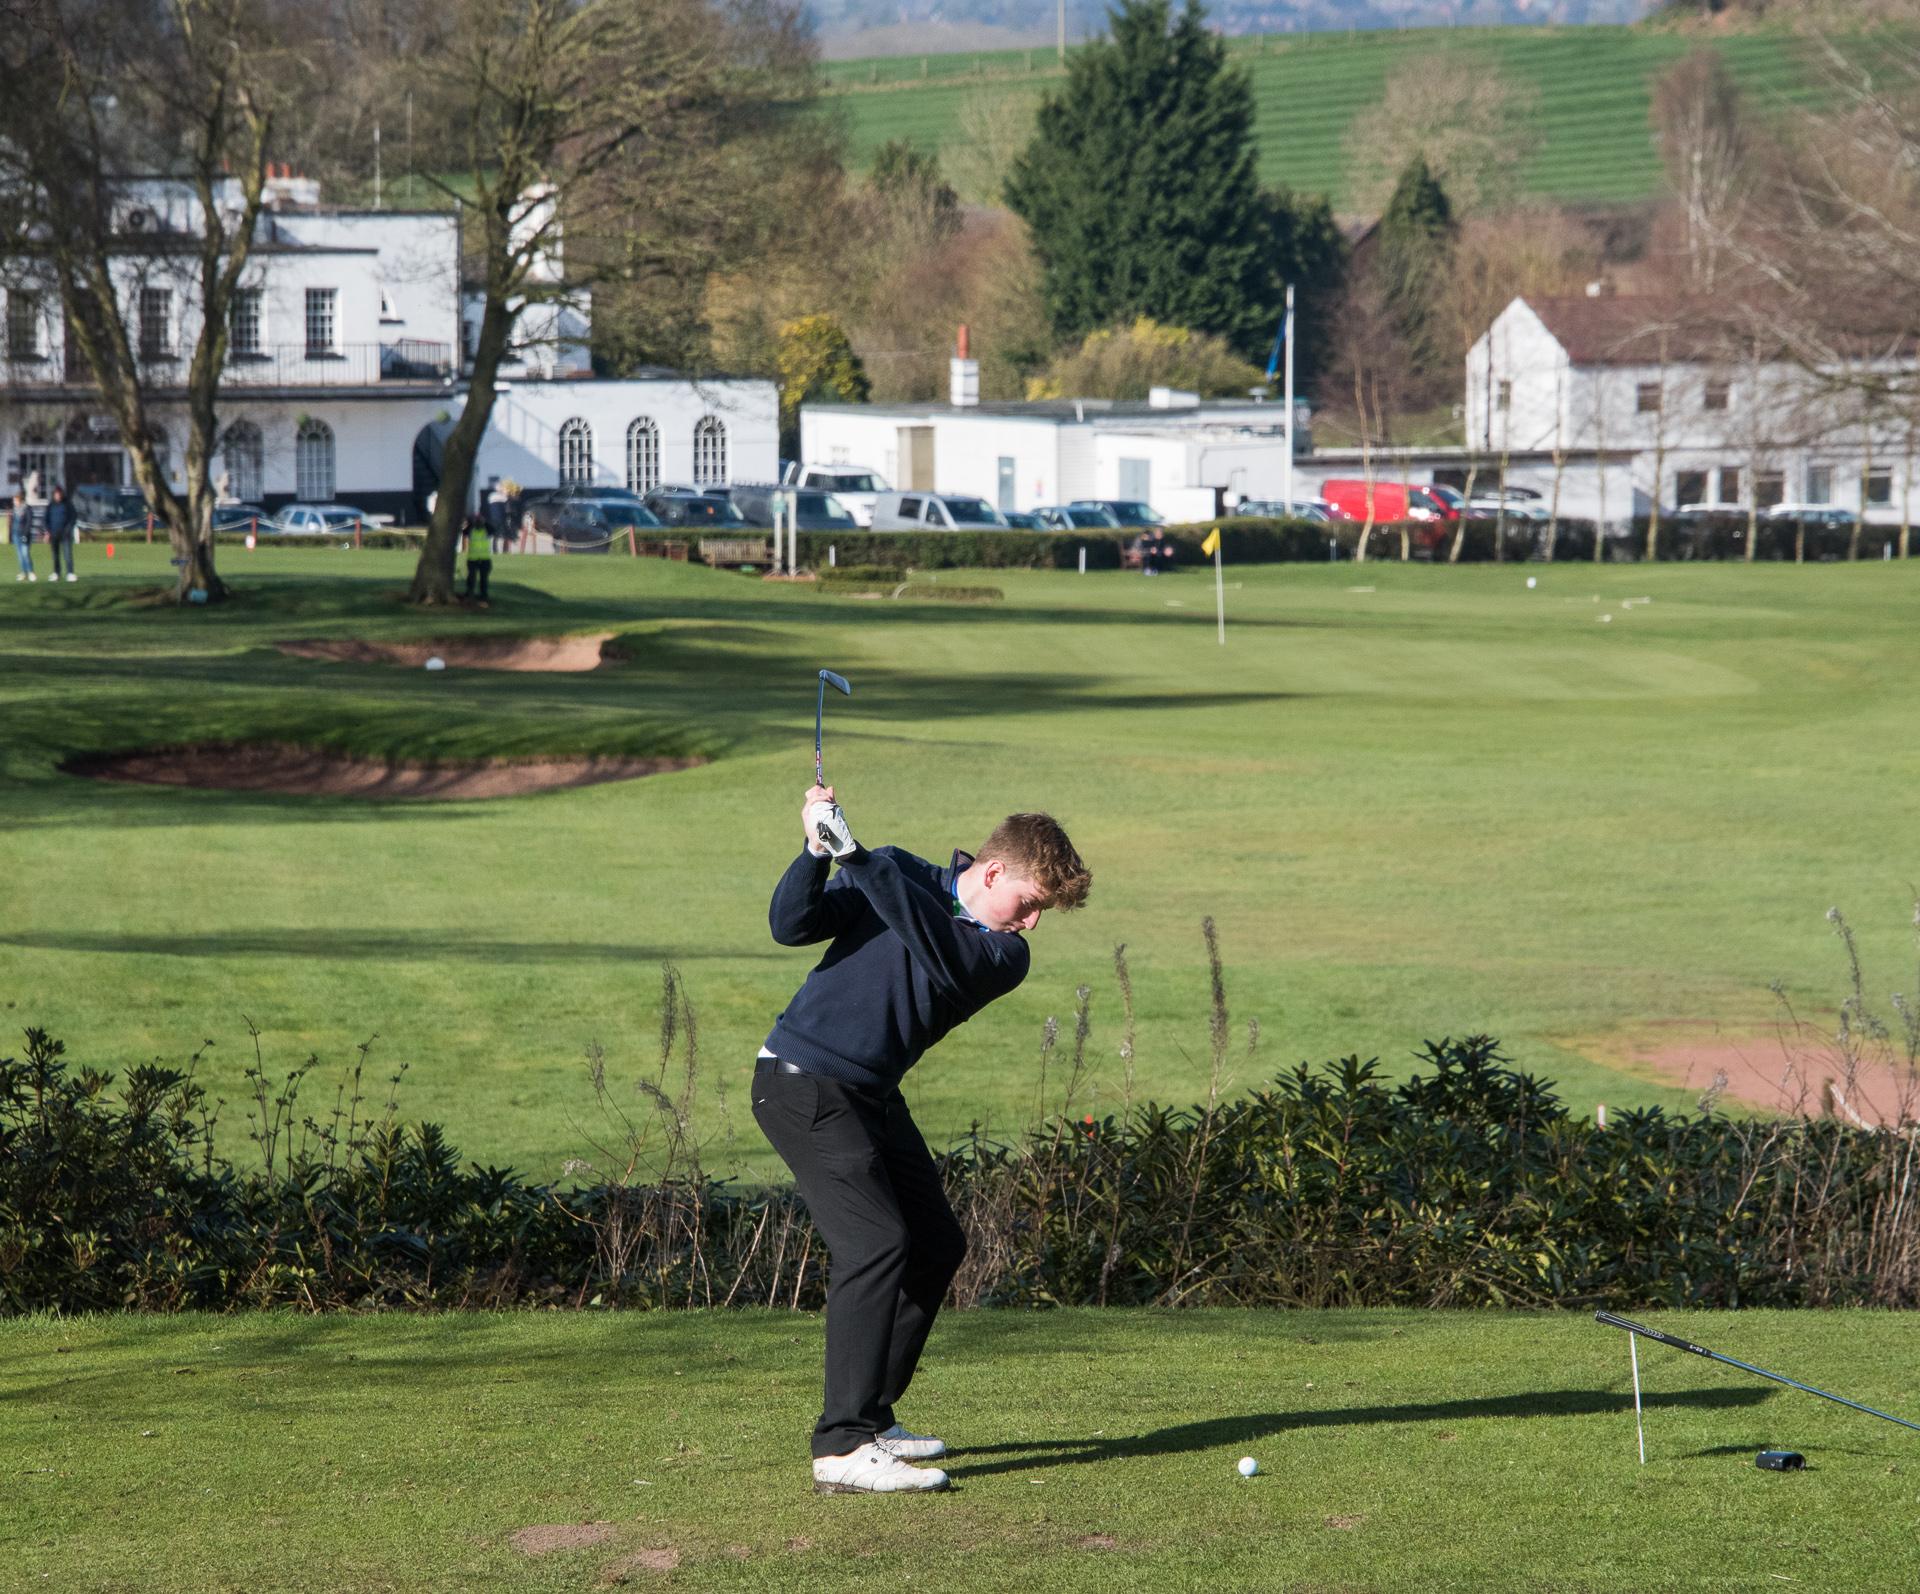 Kevindiss.com golf course photography Hawkstone Park golf course-2477-2.jpg